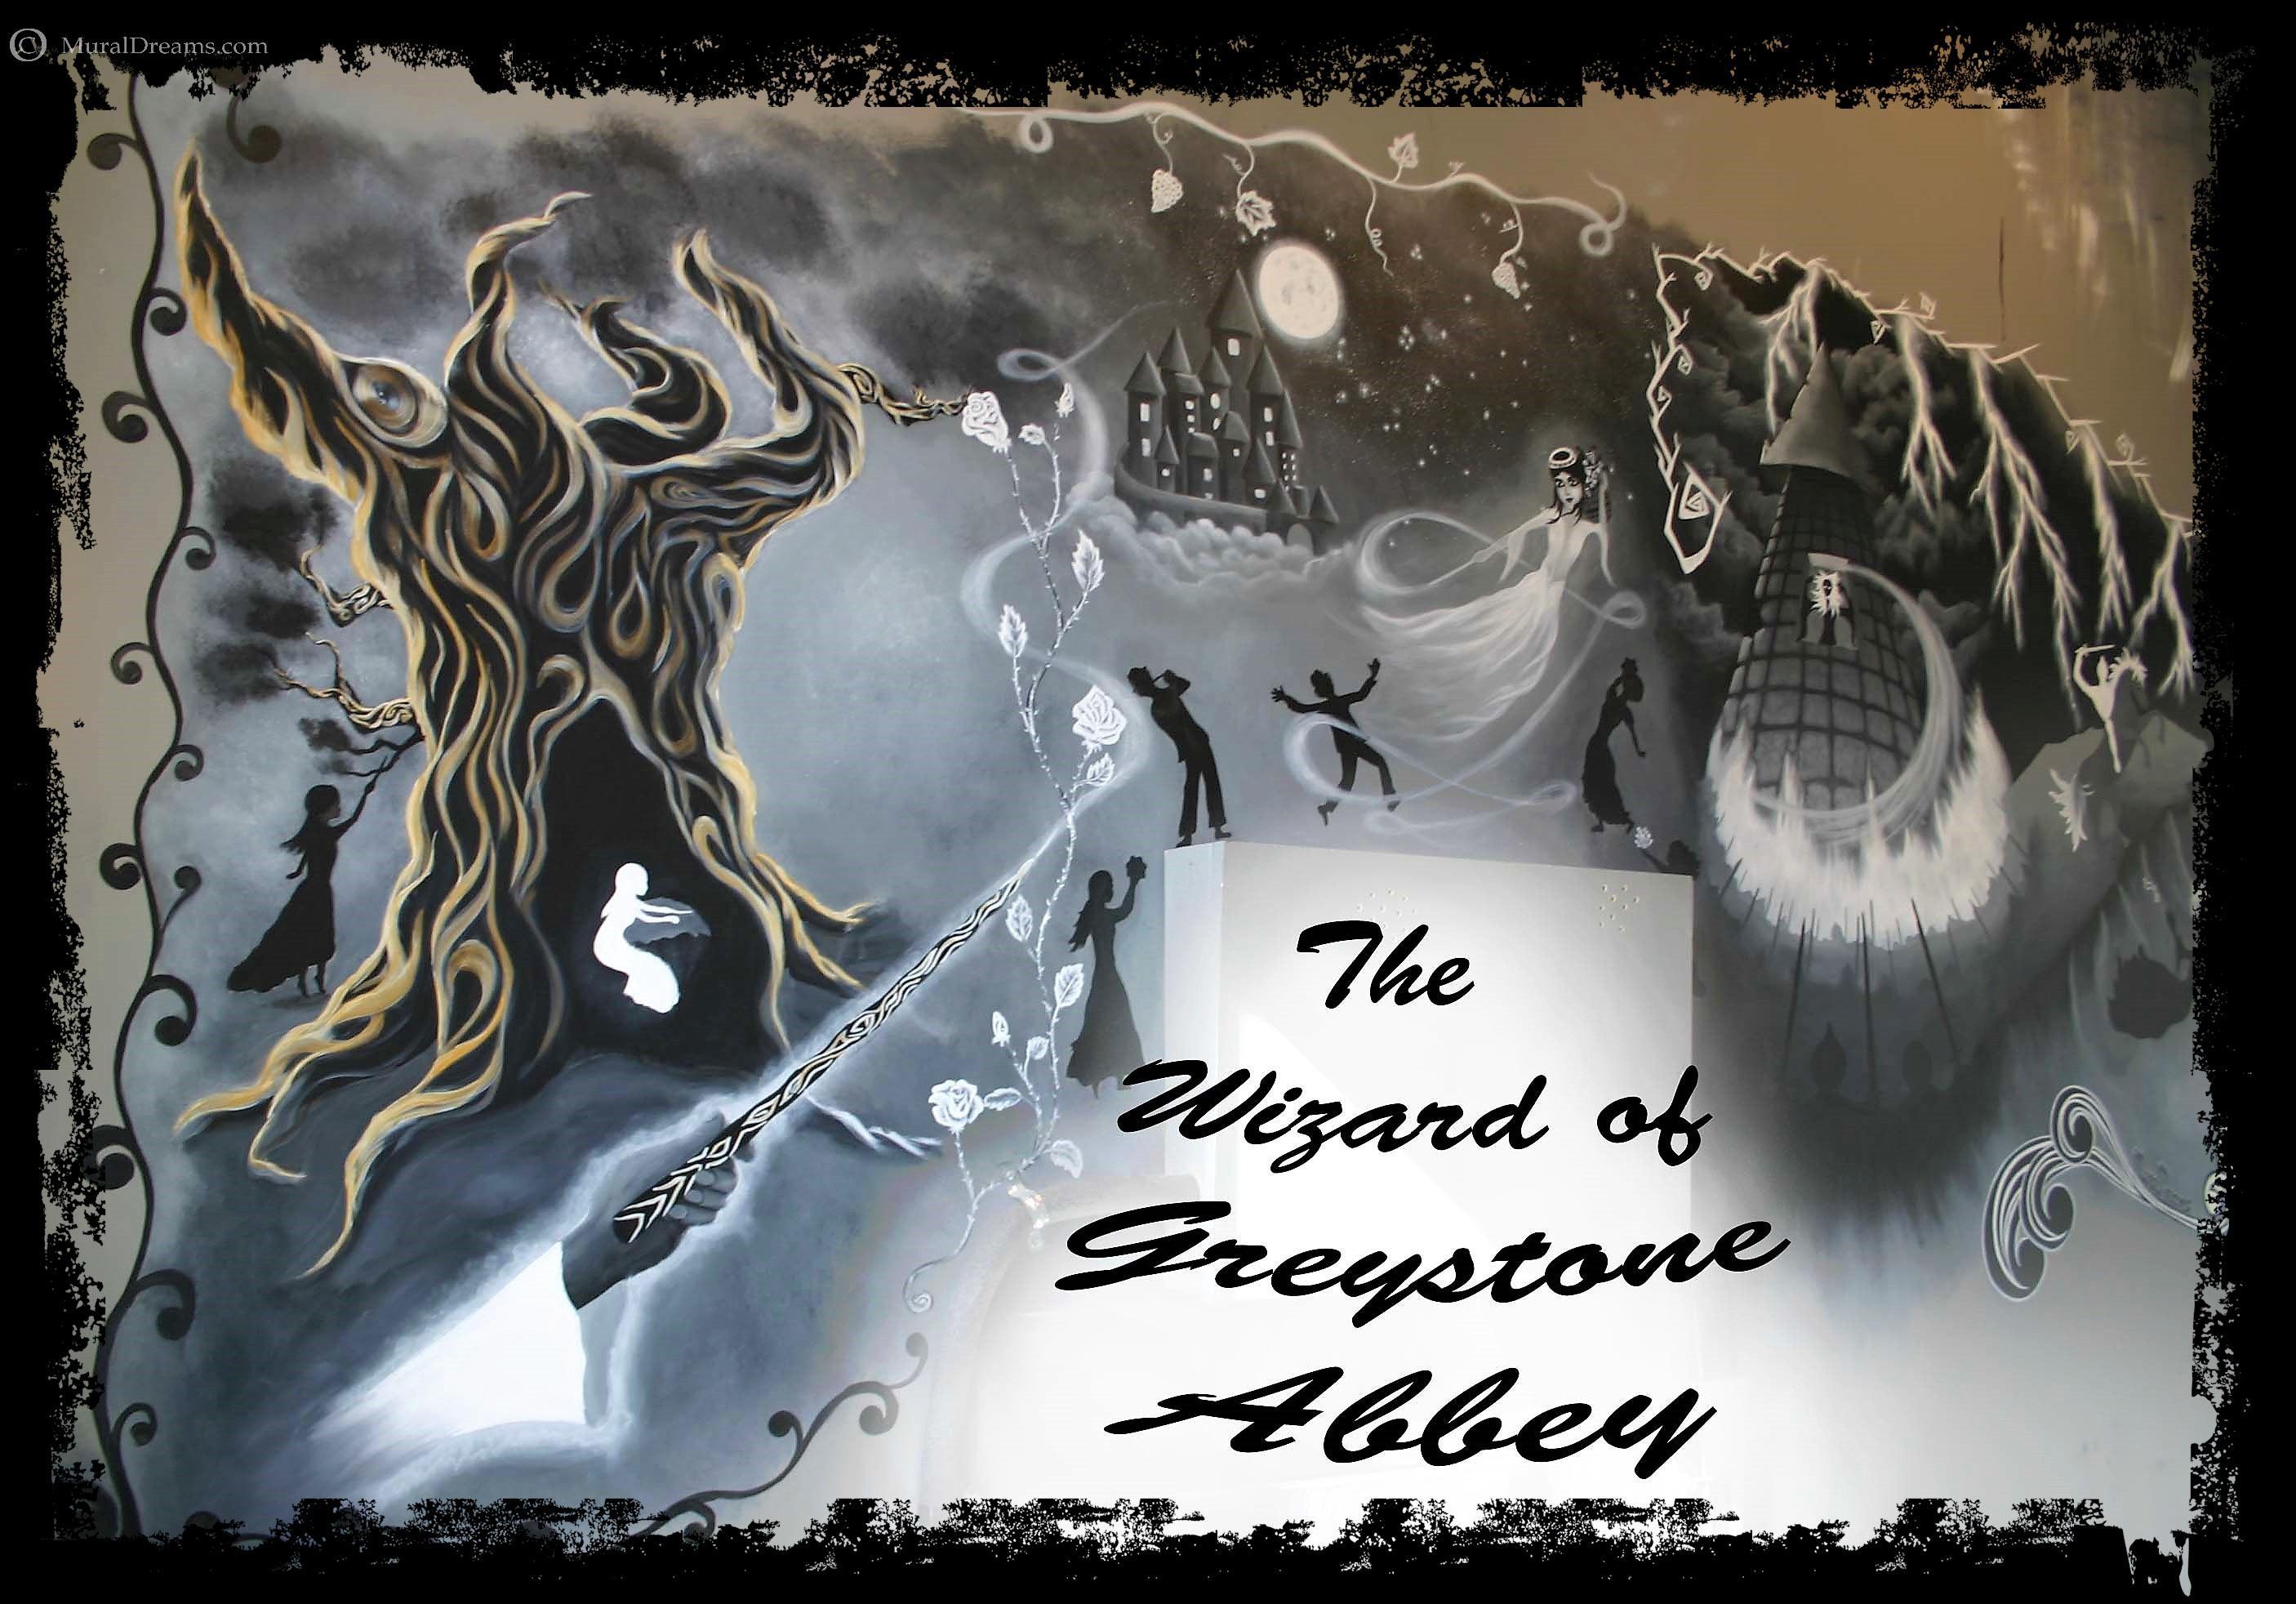 Chestnut Hill Escape Room Mural